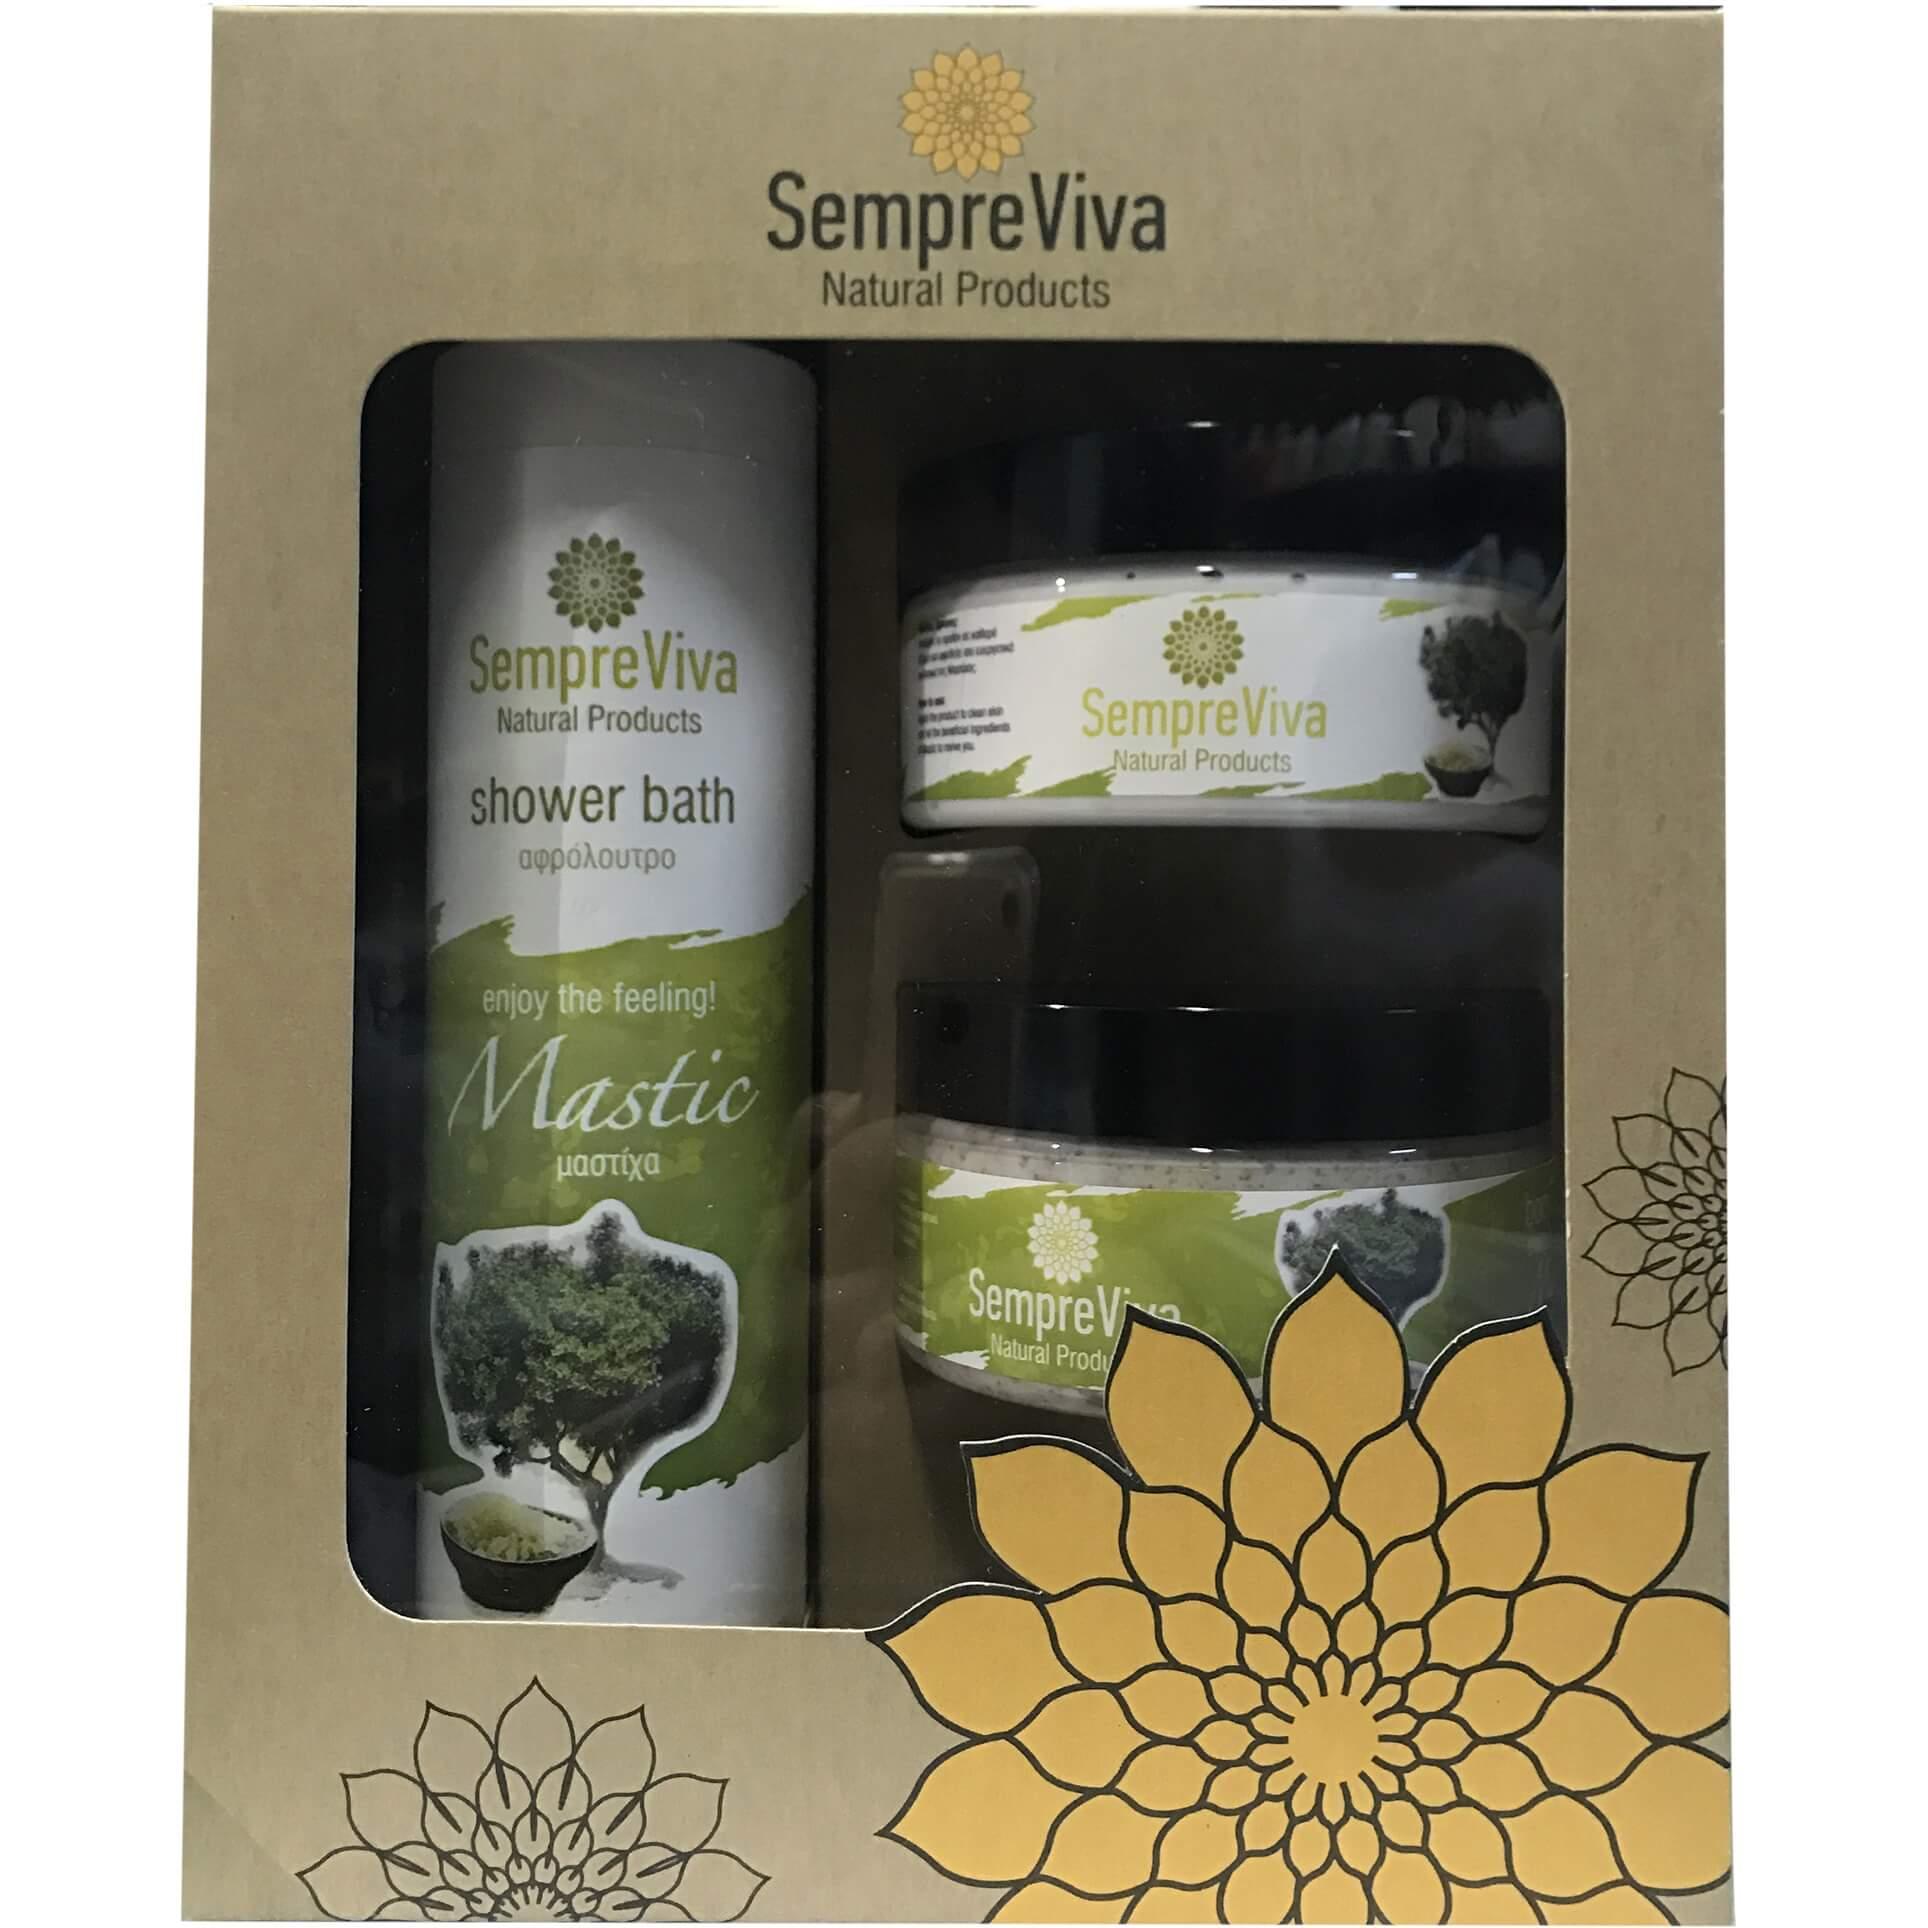 SempreViva Πακέτο Προσφοράς Περιποίησης ΣώματοςΜαστίχα Αφρόλουτρο 400ml & Body Butter 250ml & Body Scrub 250ml